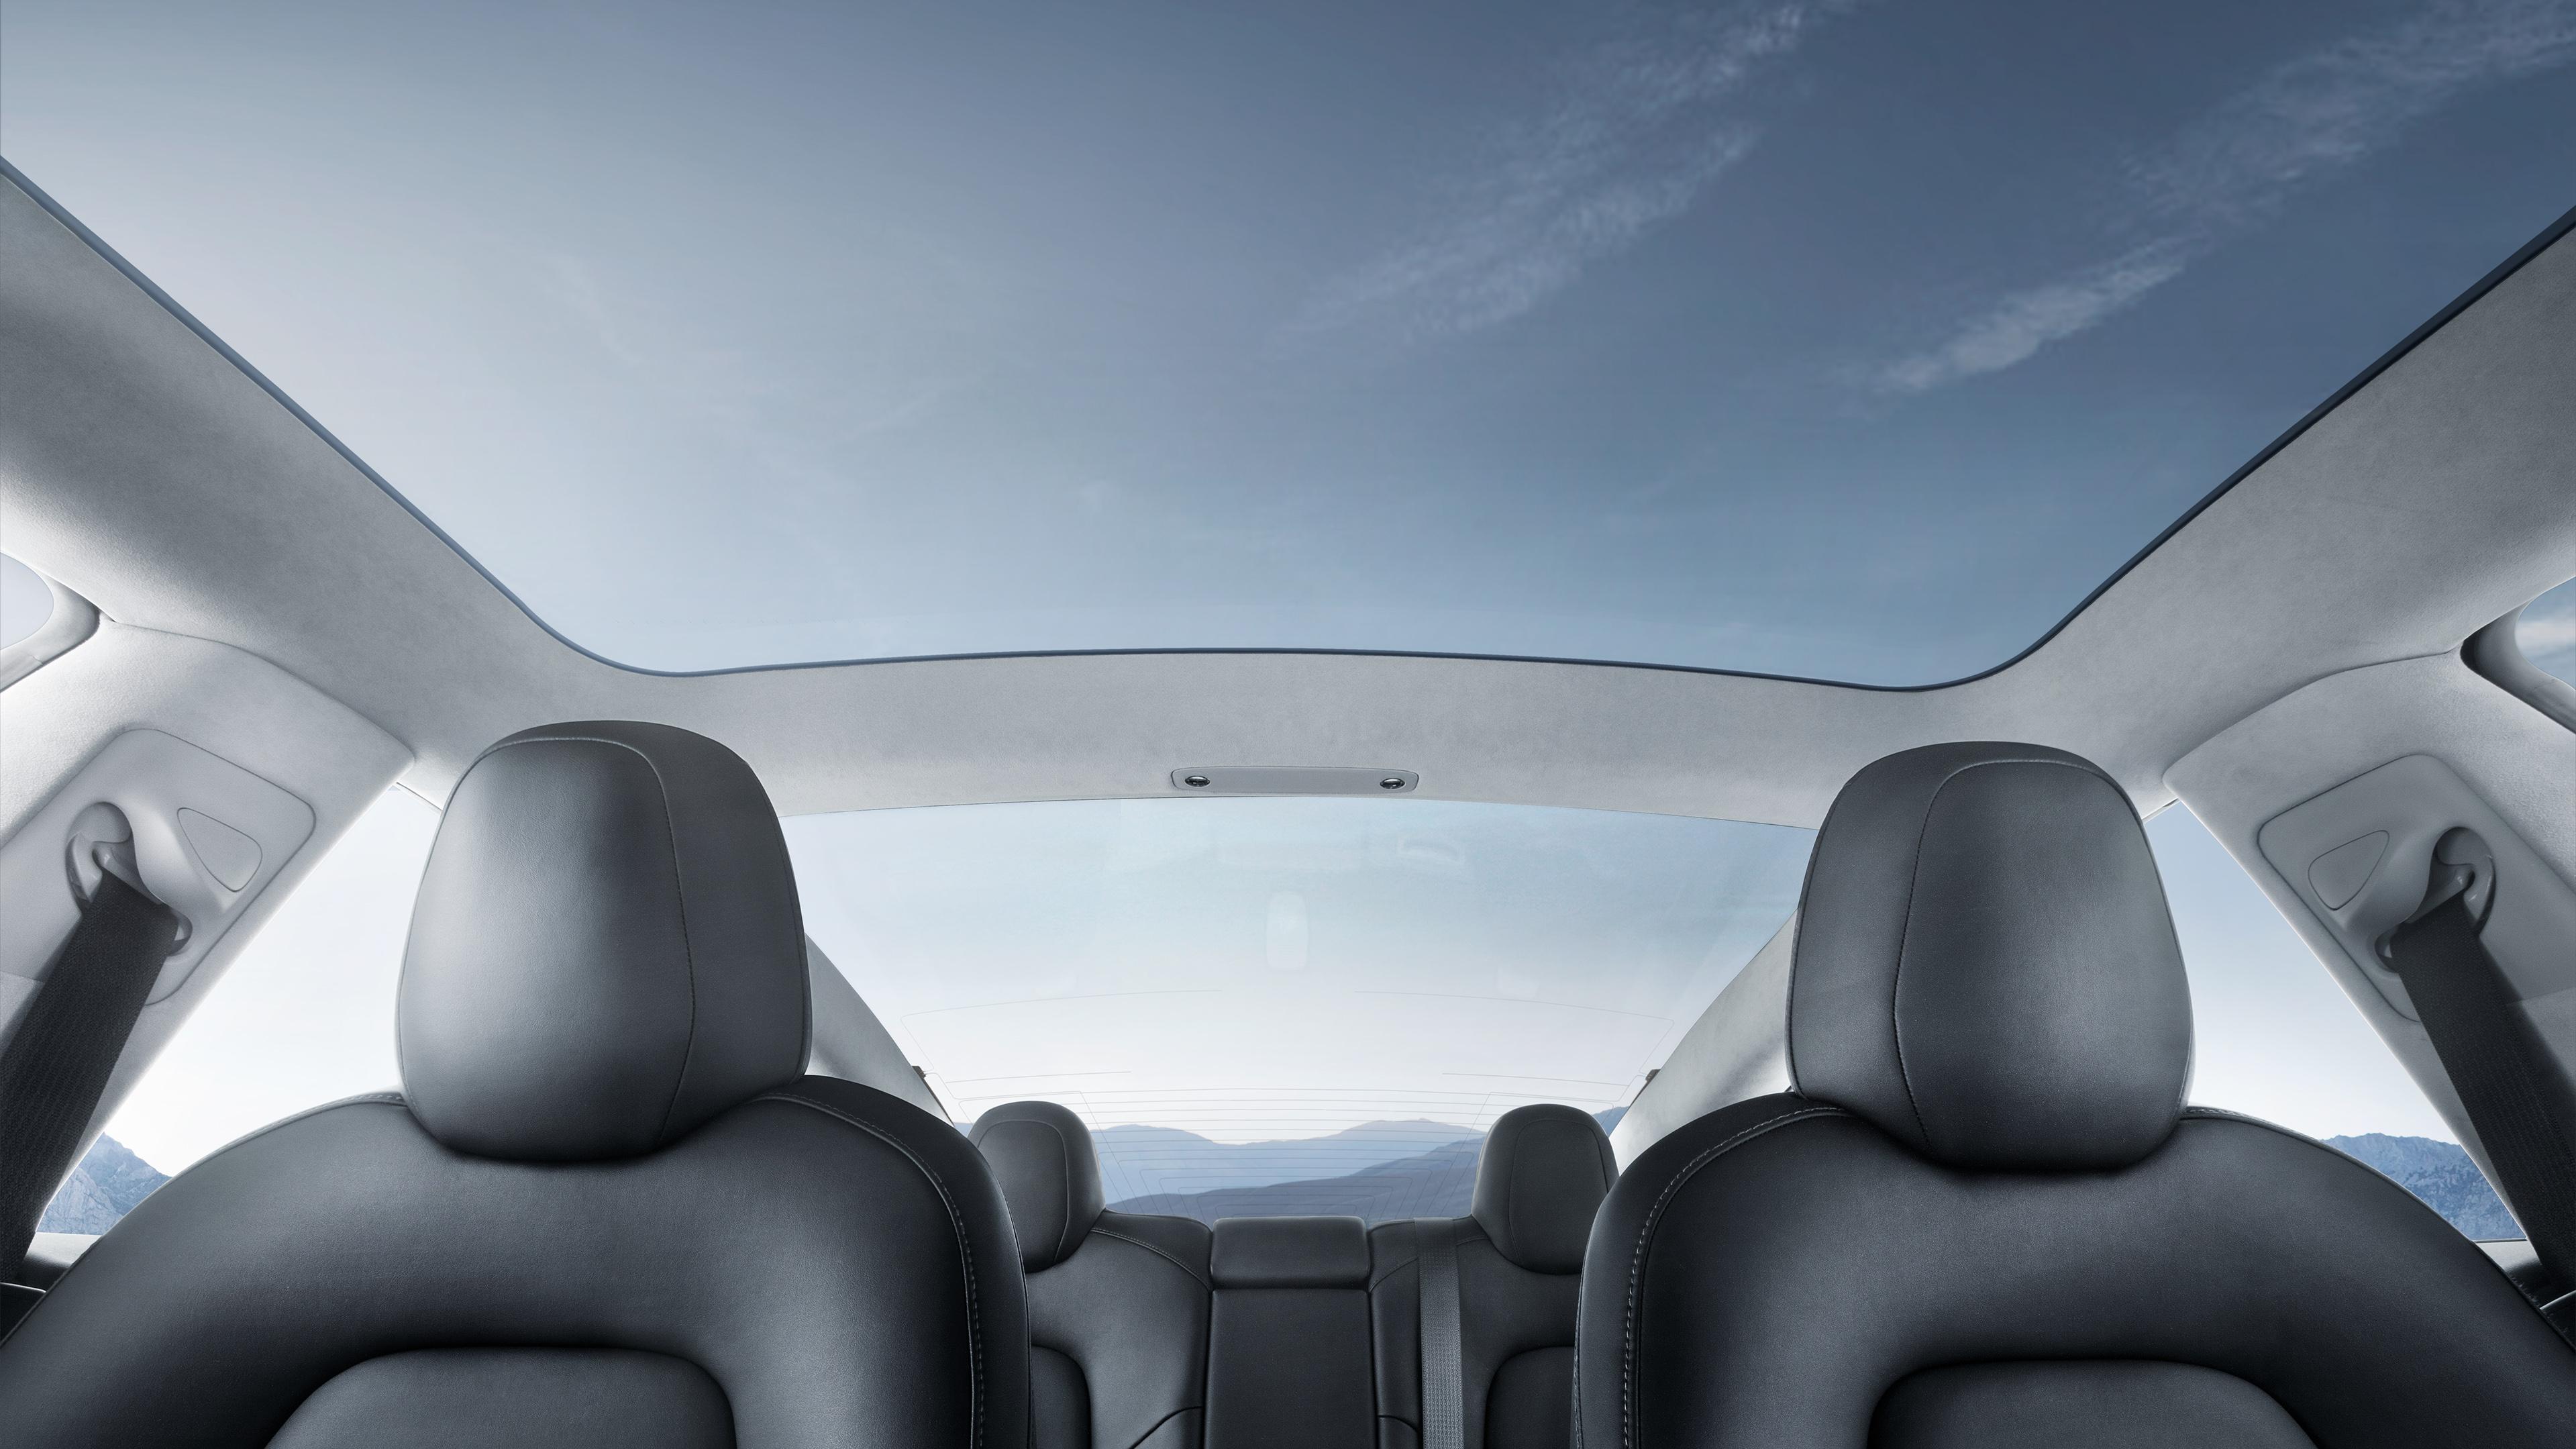 Tesla Model 3 interior glass roof